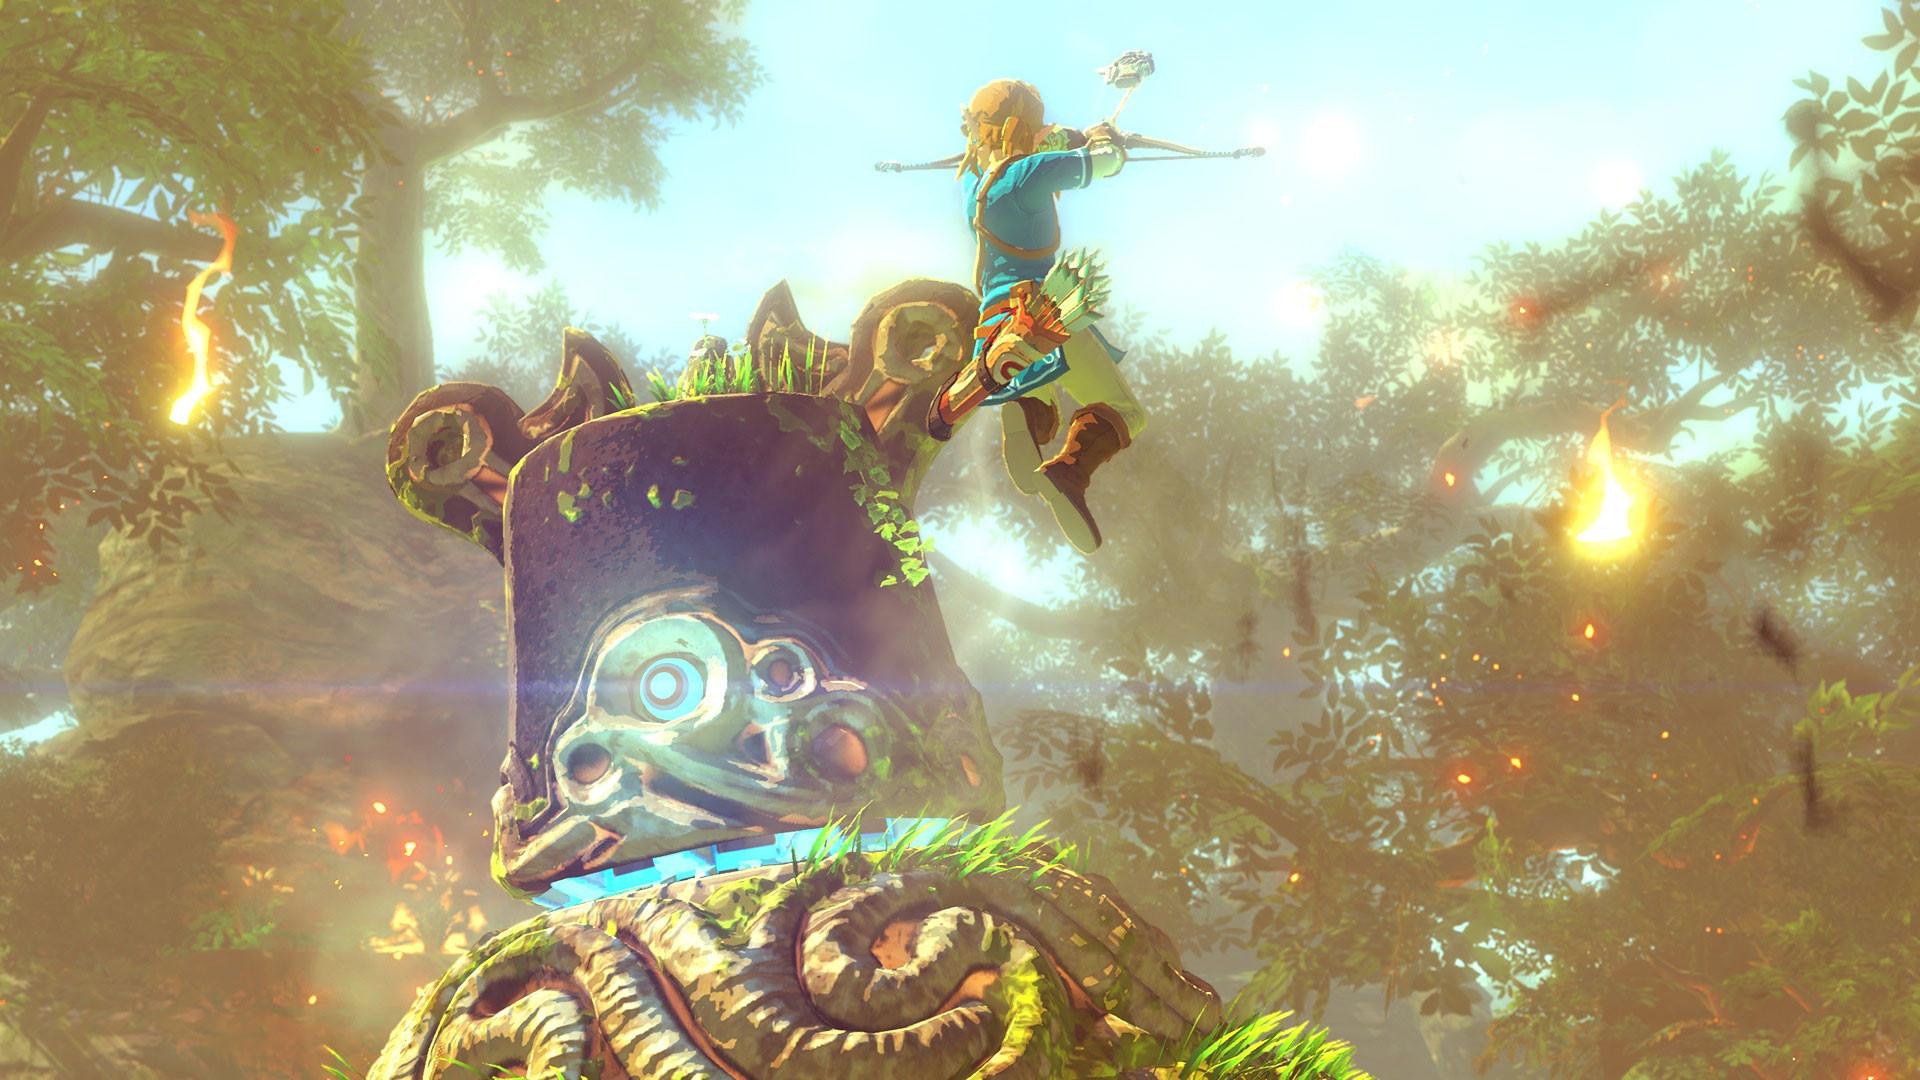 Hd wallpaper zelda – Legend Of Zelda Twilight Princess Hd 1080p Wallpaper